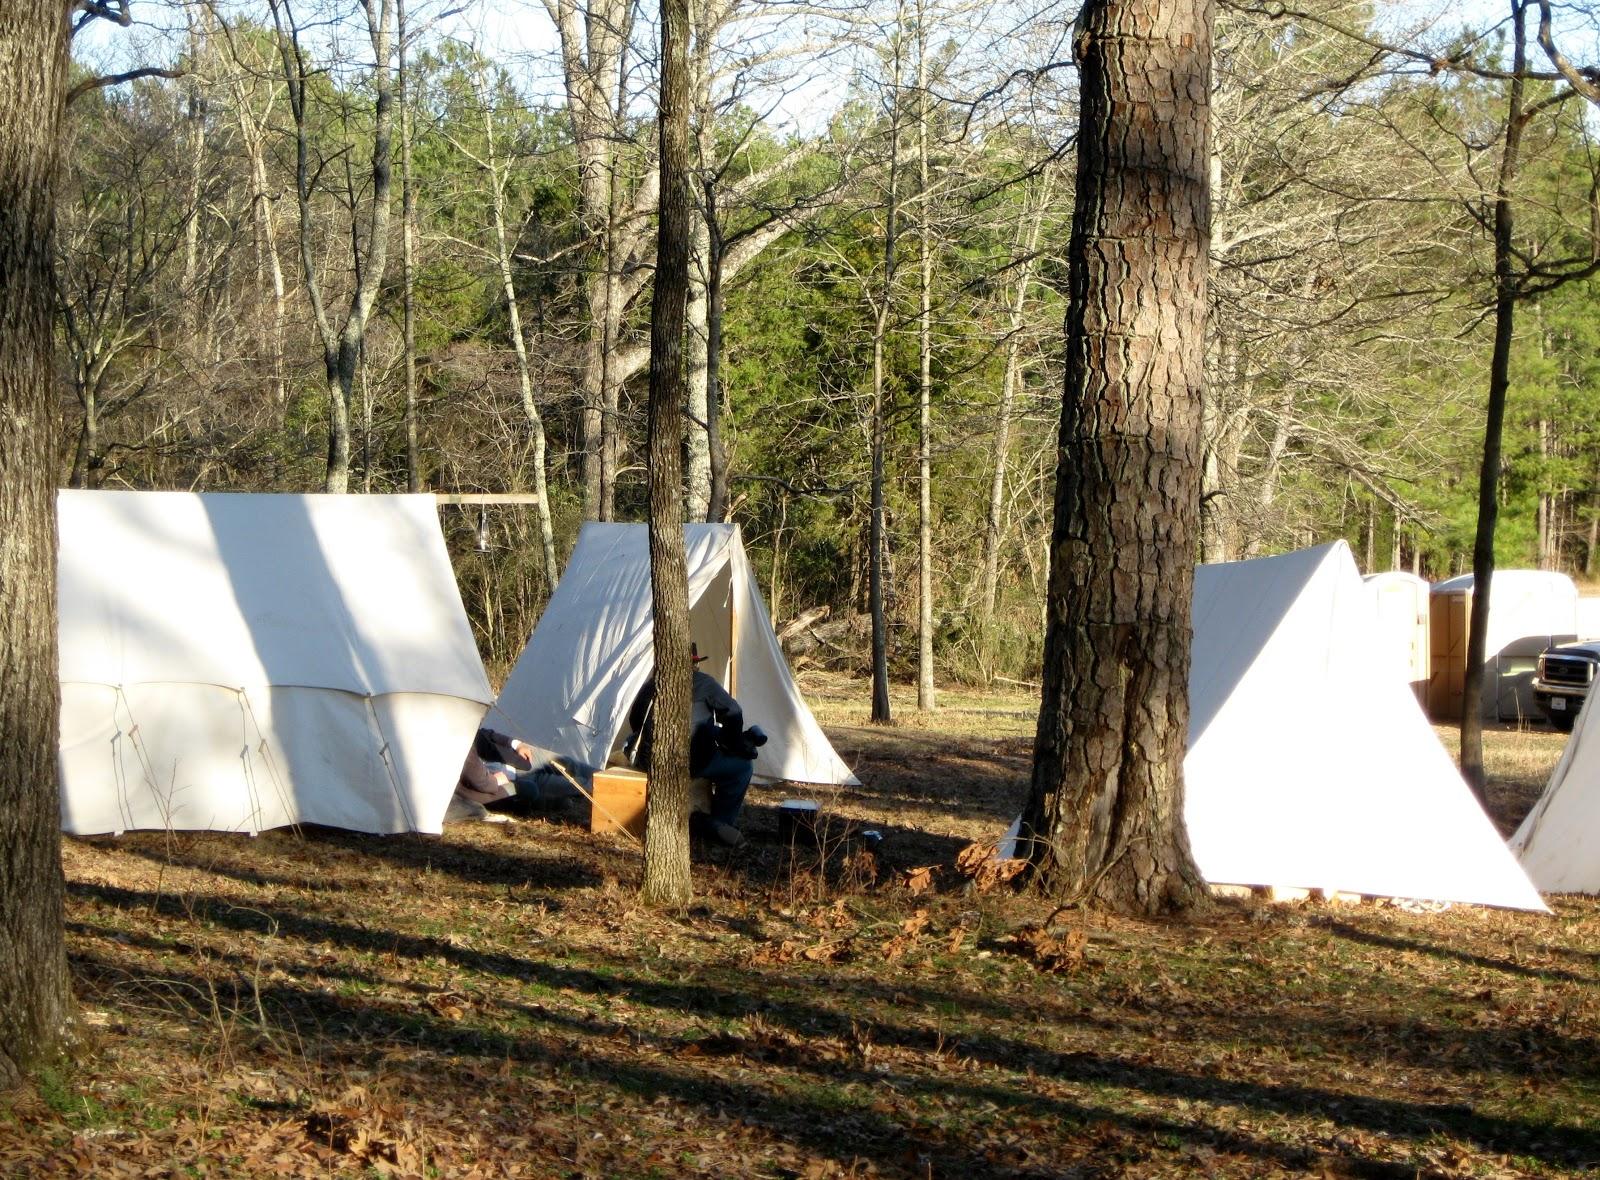 You are Chickamauga Civil War Reenactment civil war